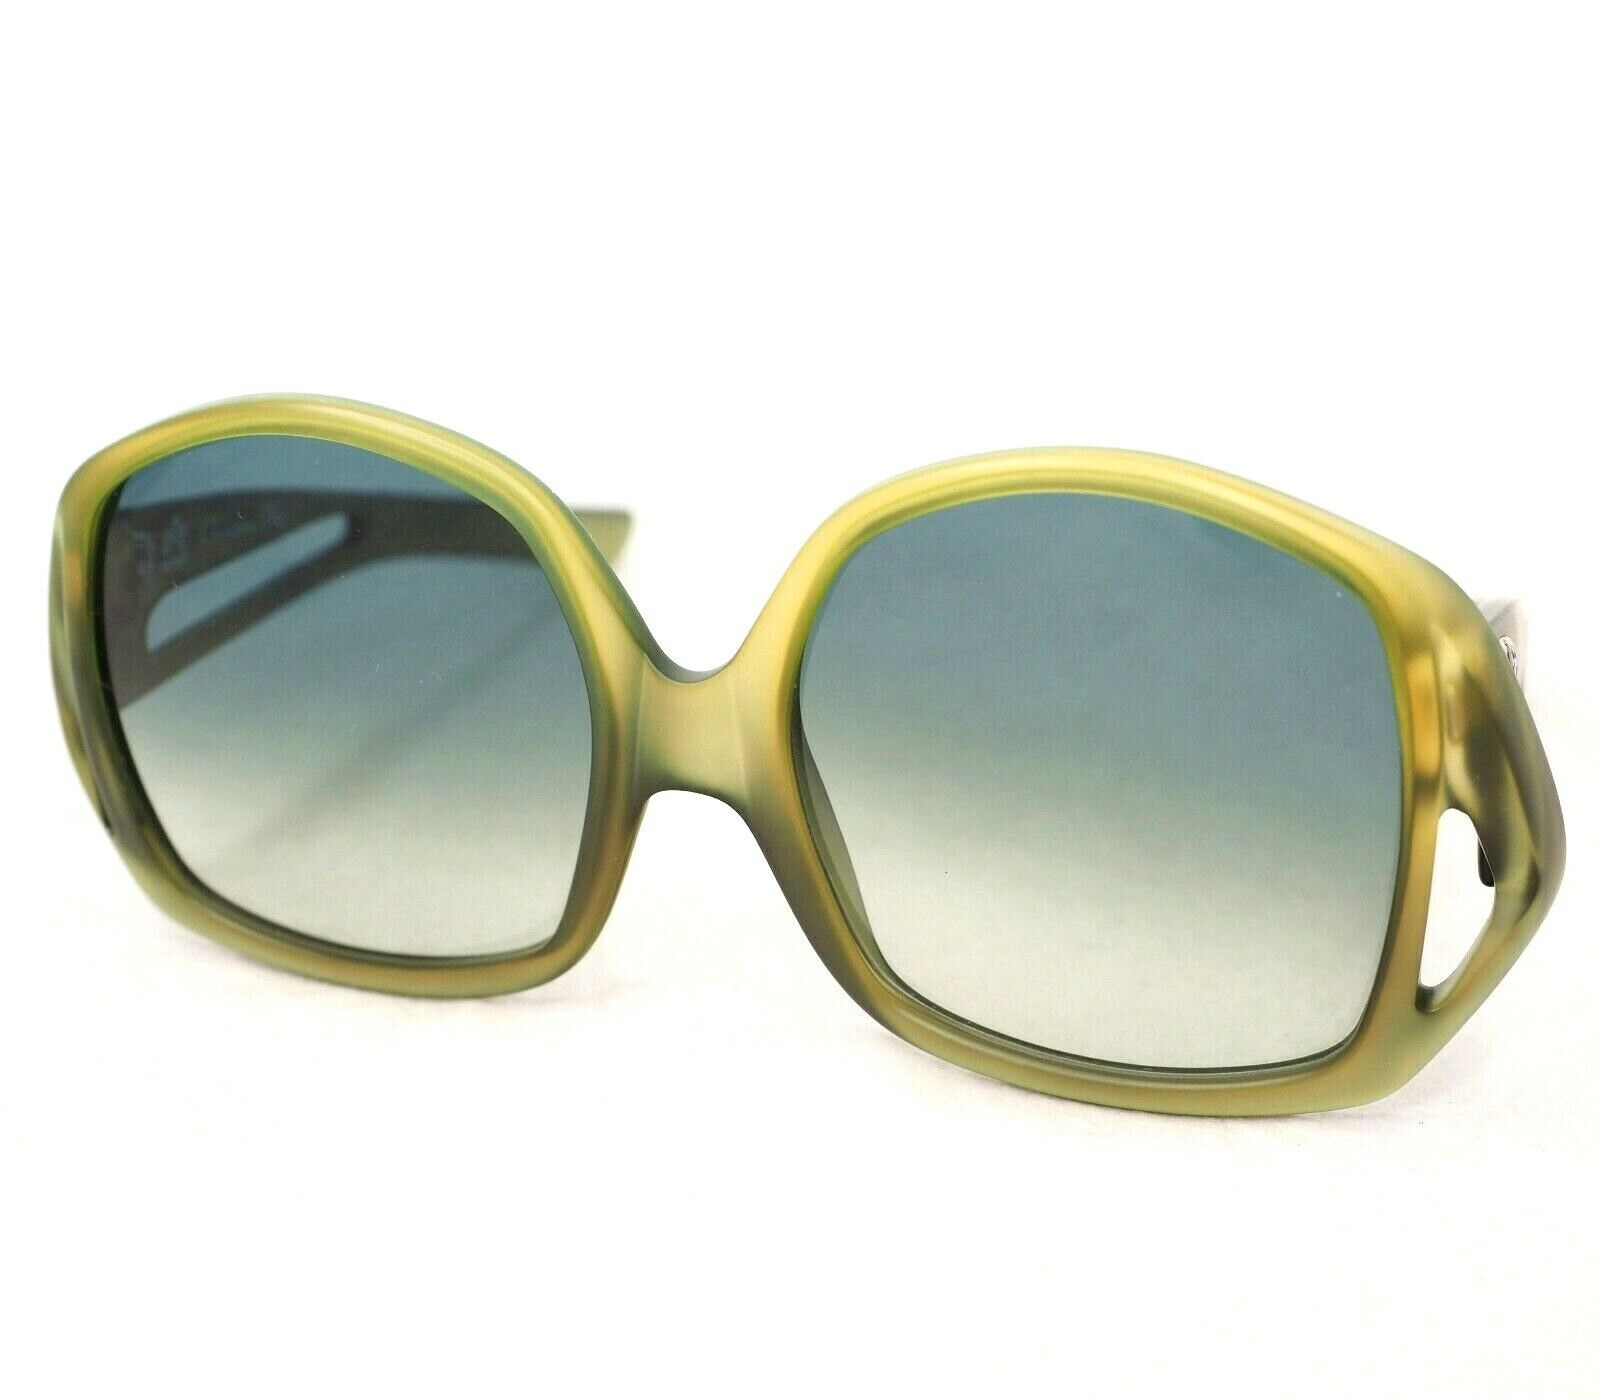 CHRISTIAN DIOR sunglasses vintage amber green oversize rectangular butterfly